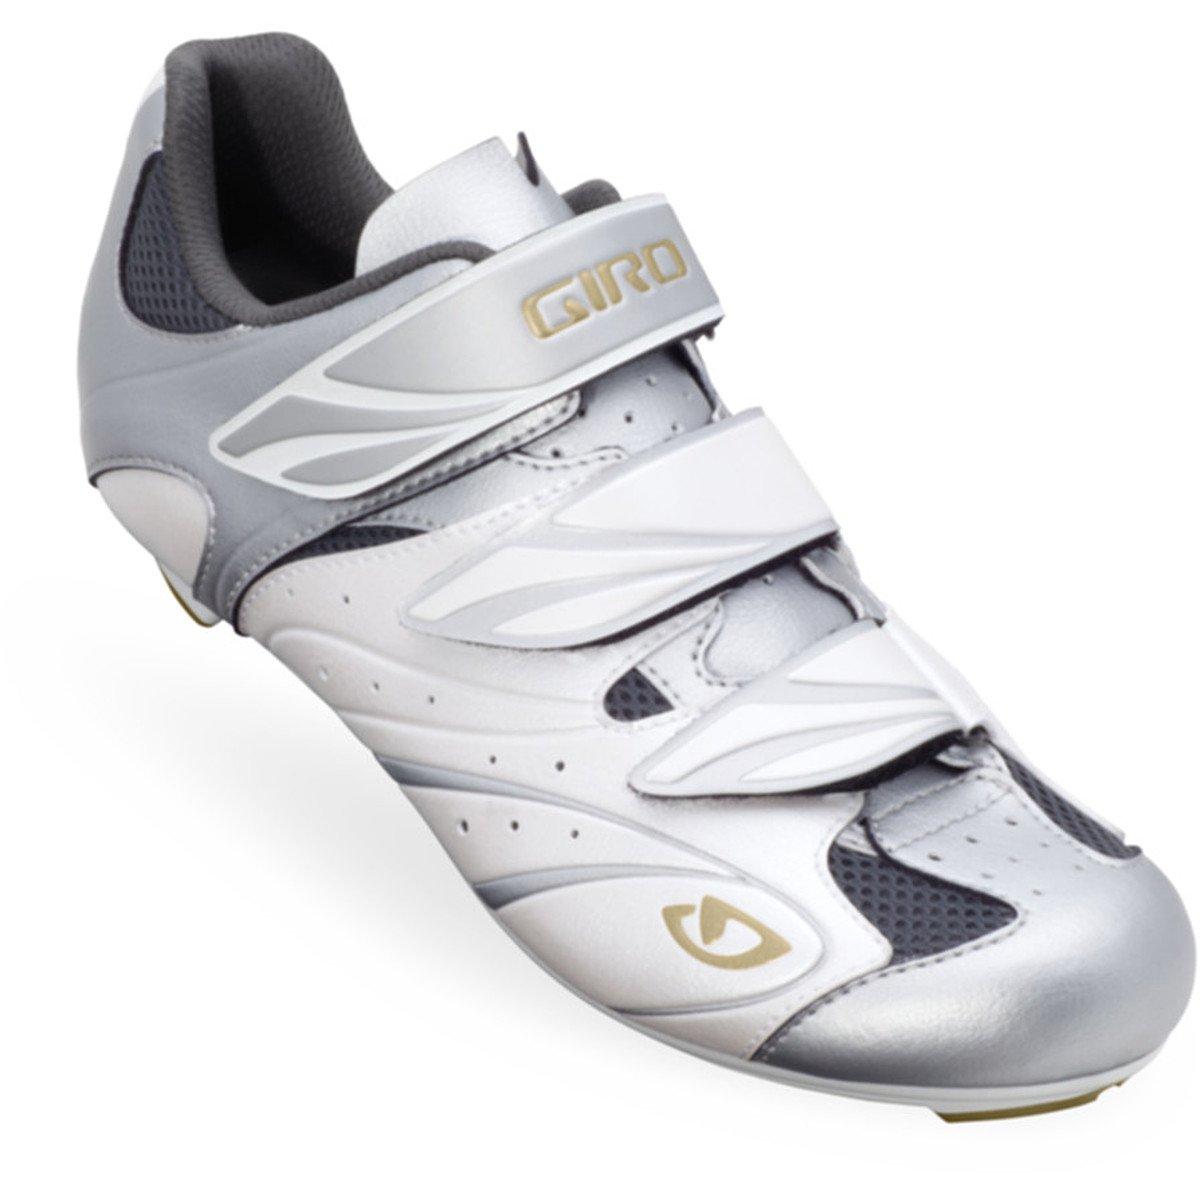 Giro レディース 36 White/Silver/Gold B009AZ6W9O